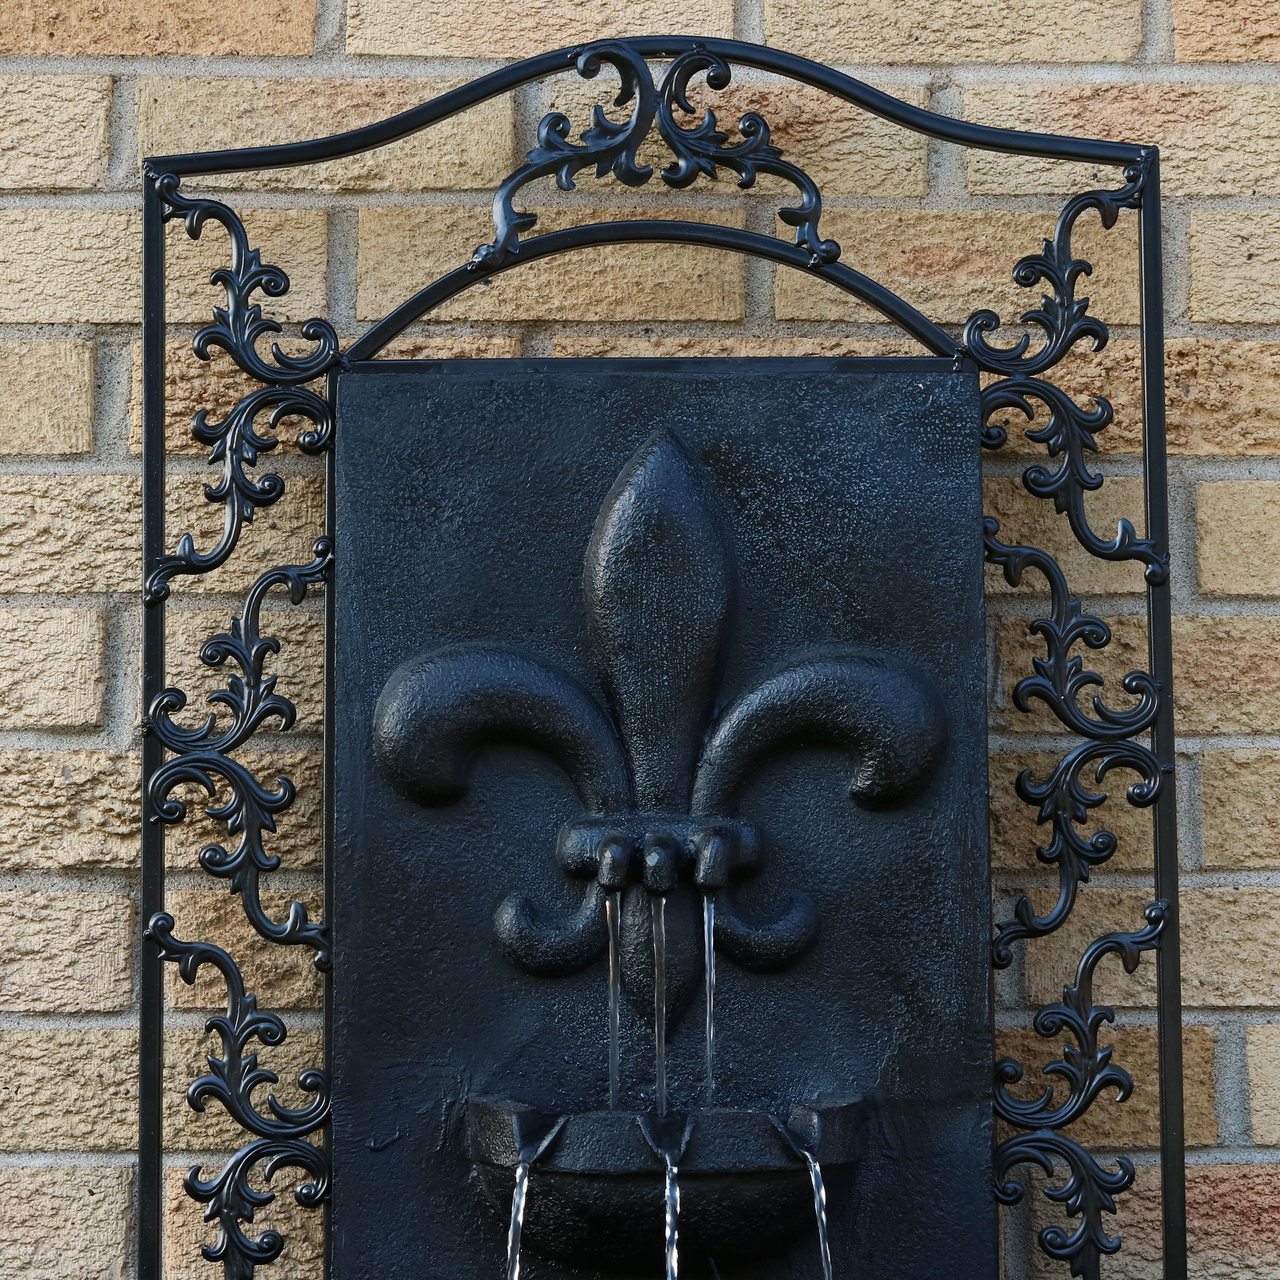 Sunnydaze French Lily Solar Outdoor Wall Fountain, Includes Solar ...